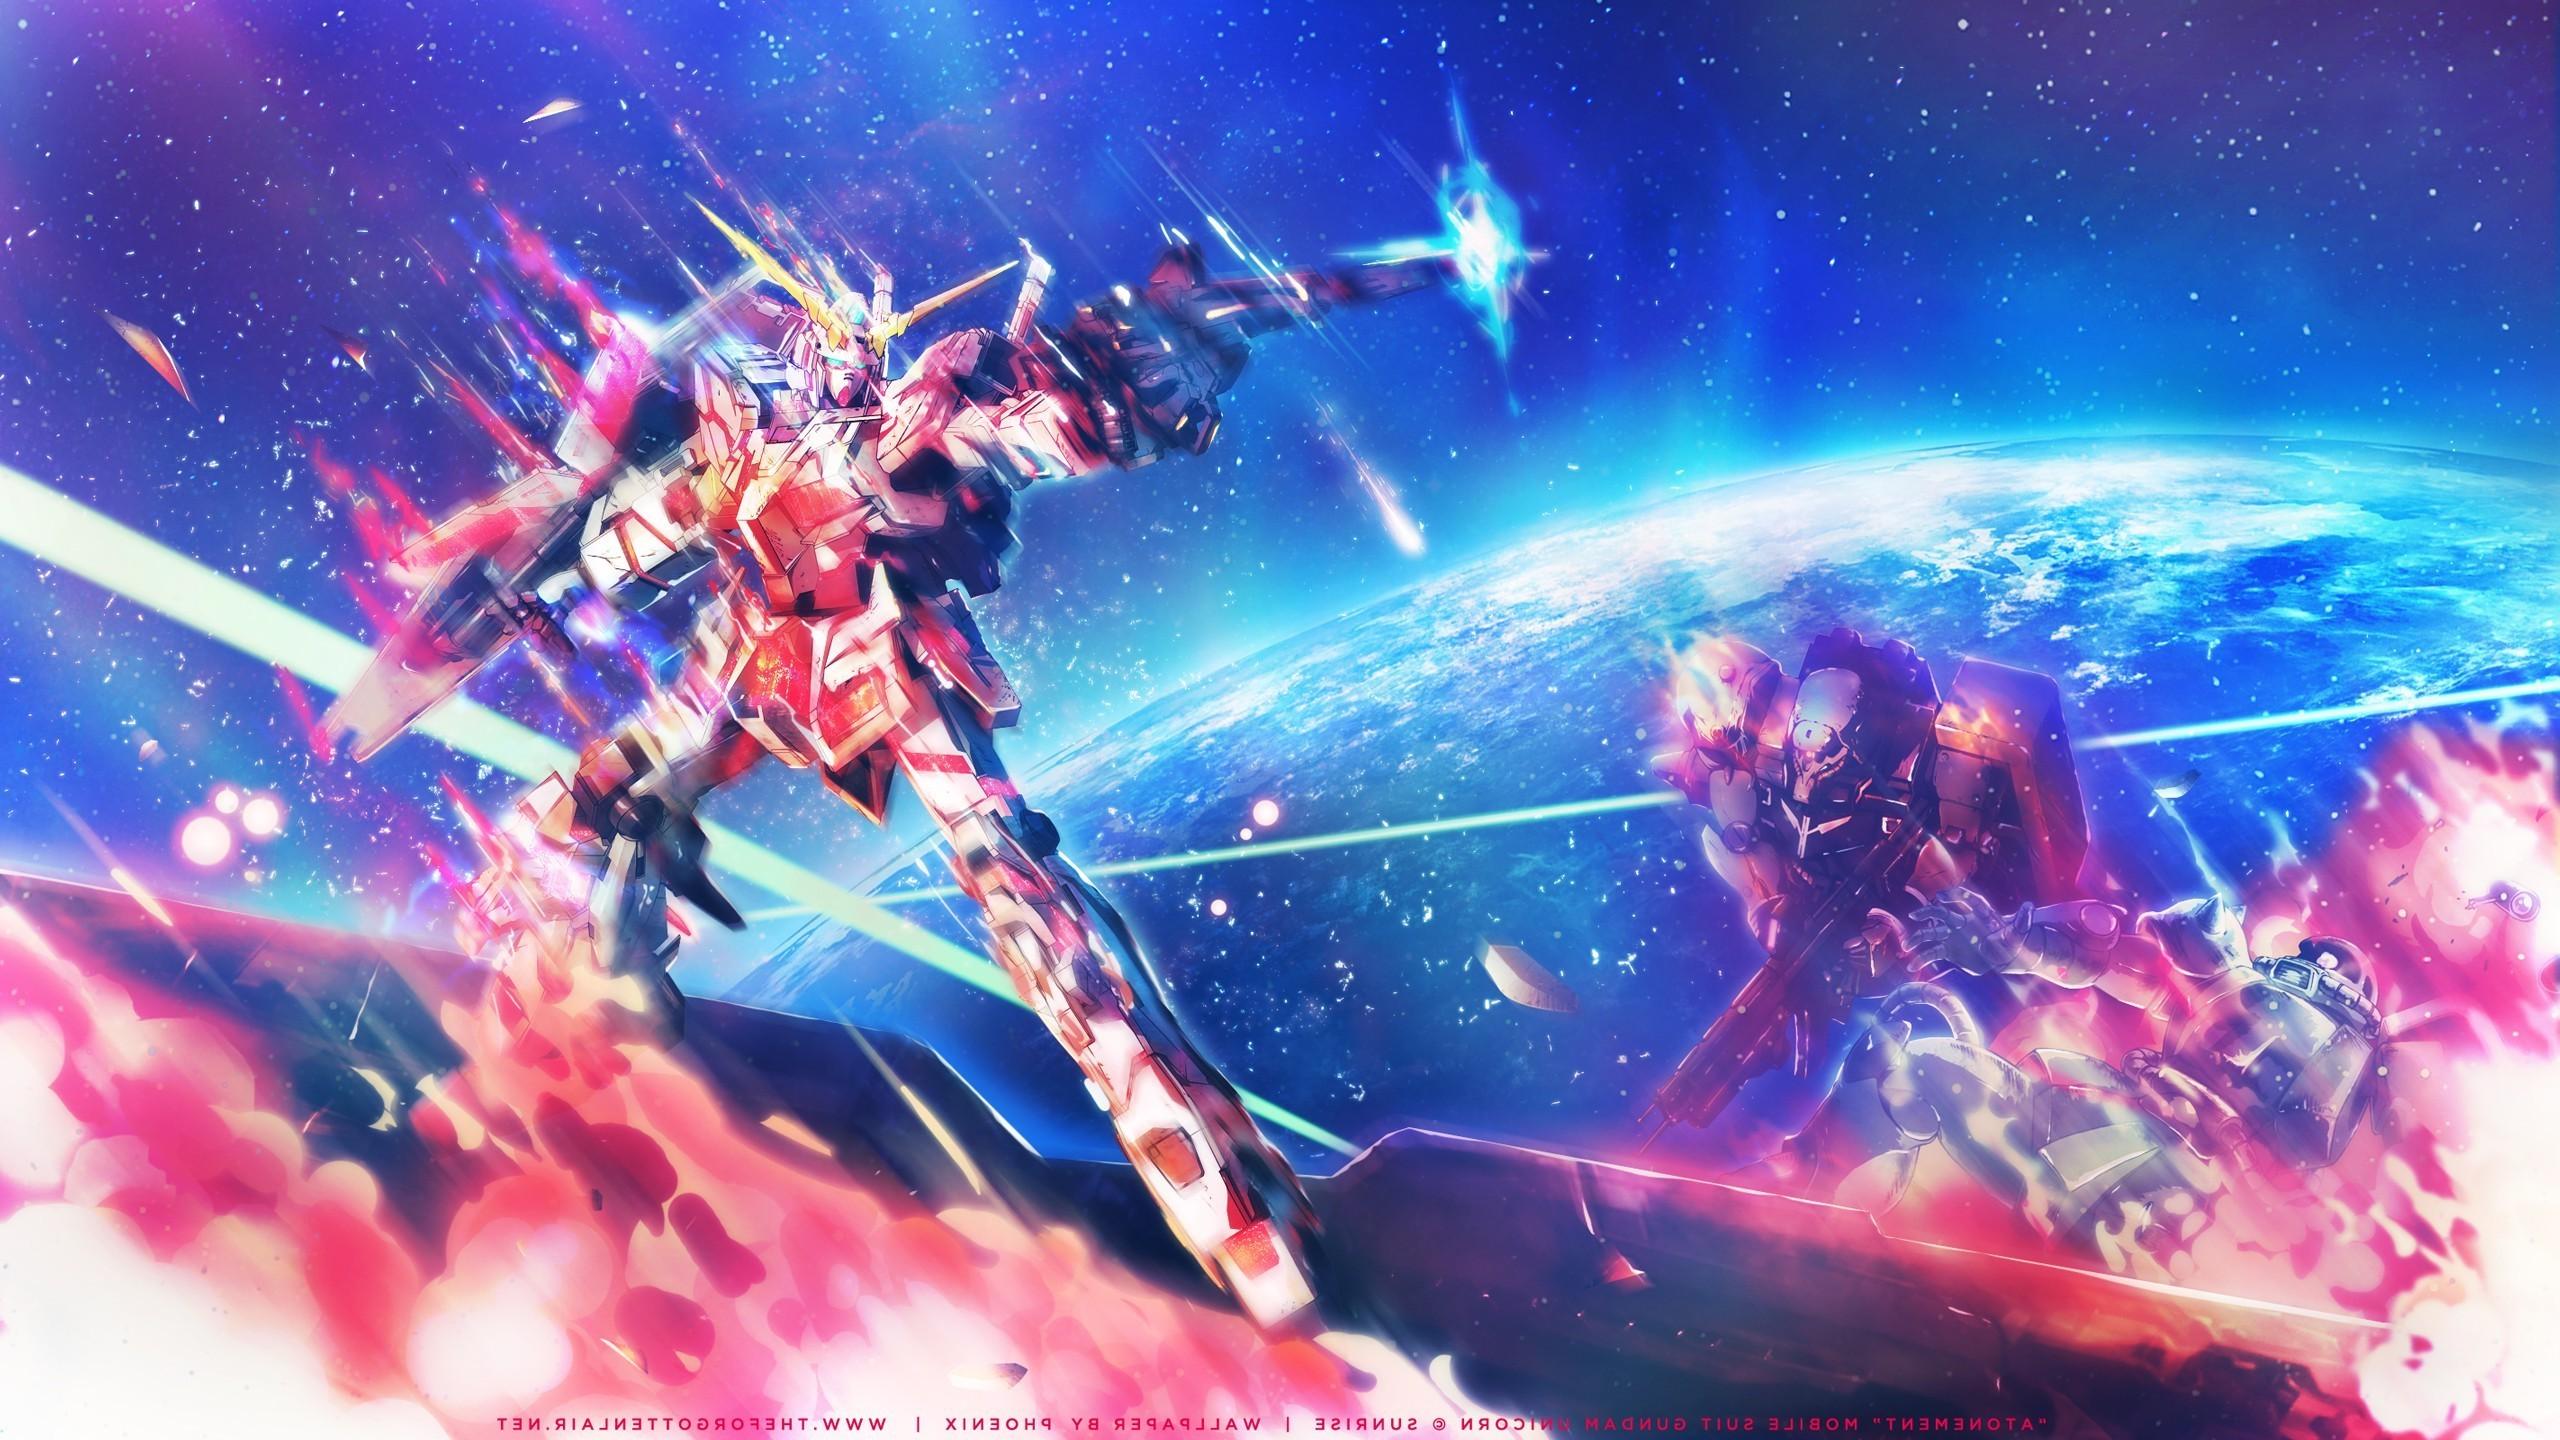 Mobile Suit Gundam Unicorn, Mech, Mobile Suit Gundam, Gundam Wallpapers HD  / Desktop and Mobile Backgrounds